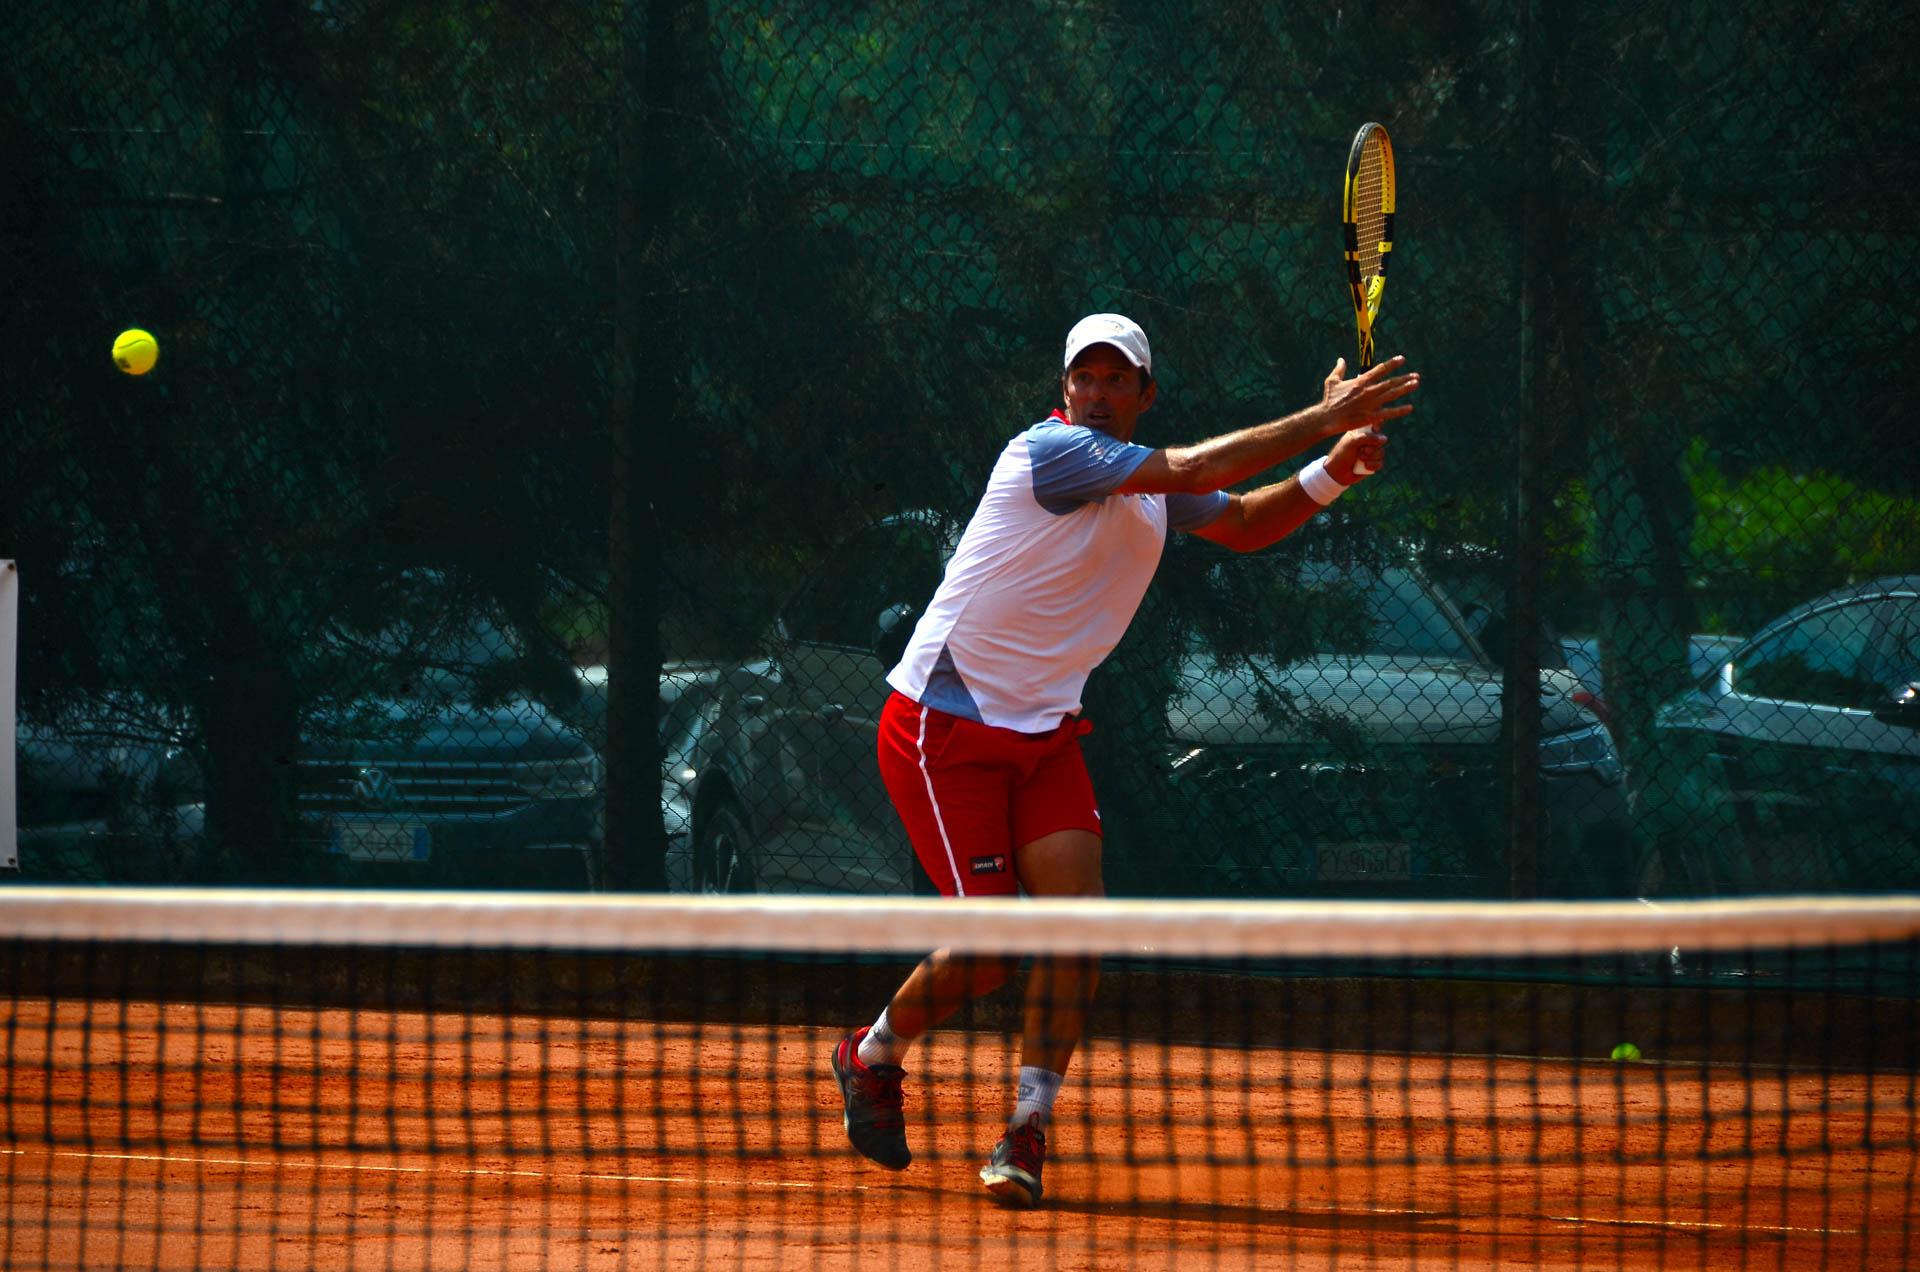 Viola Tennis vs TC Siracusa, Serie B2, Sesta giornata, 13 giugno 2021